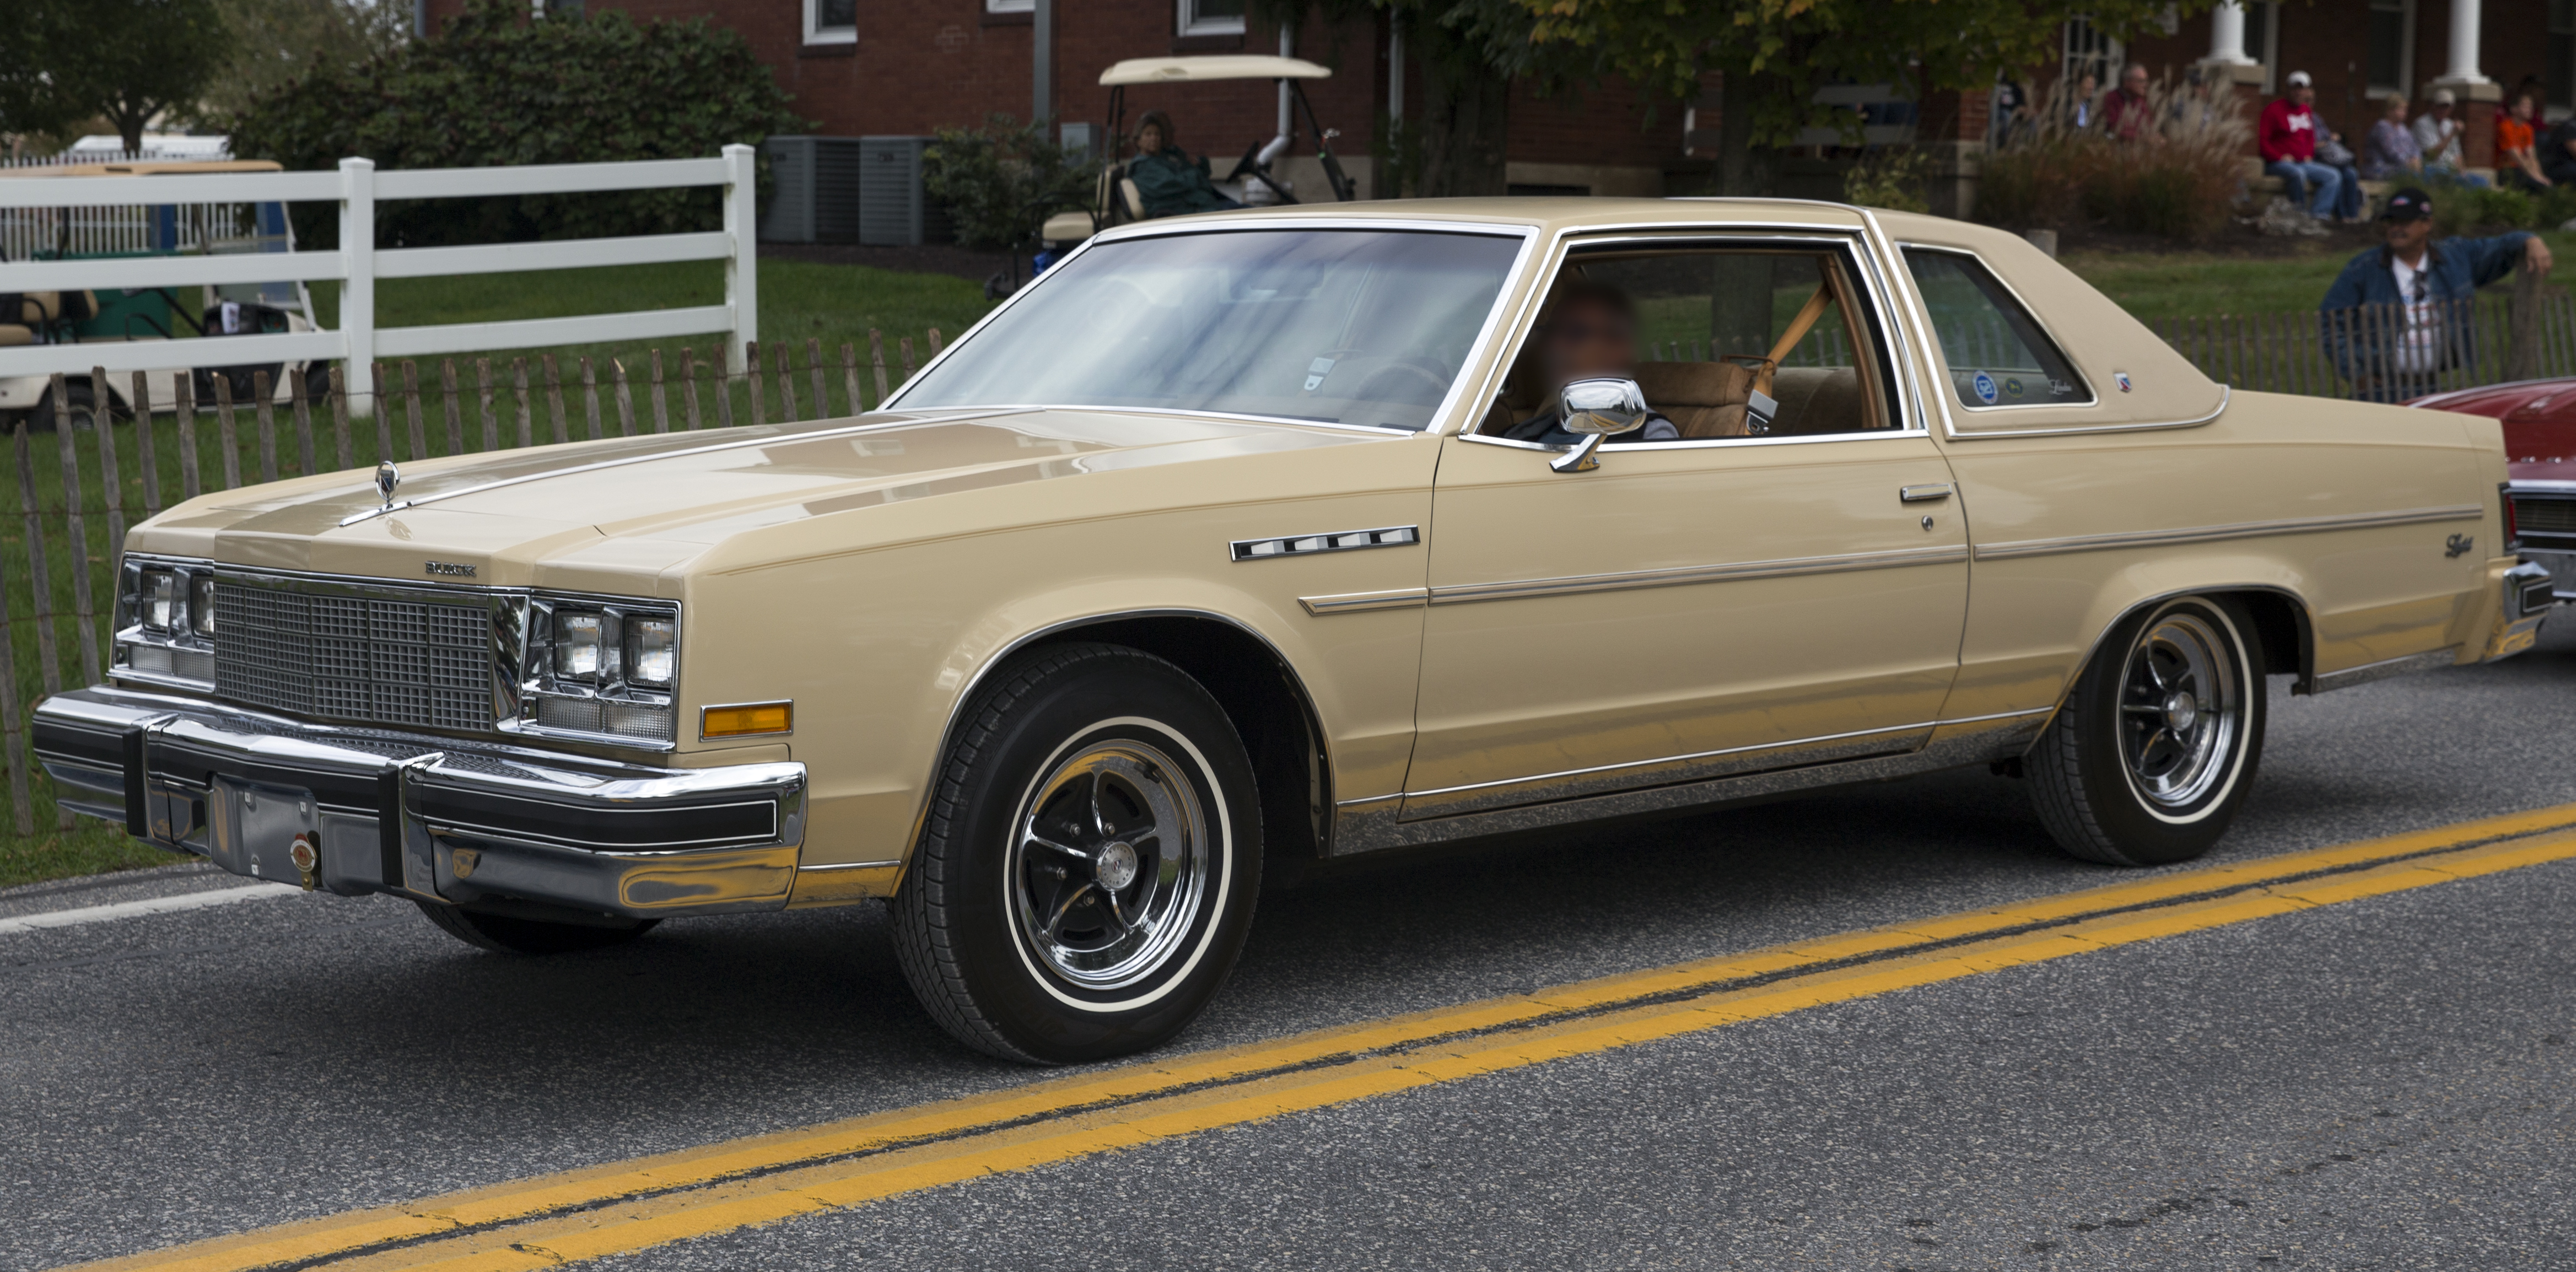 File:1979 Buick Electra Limited Landau Coupe, front left ...